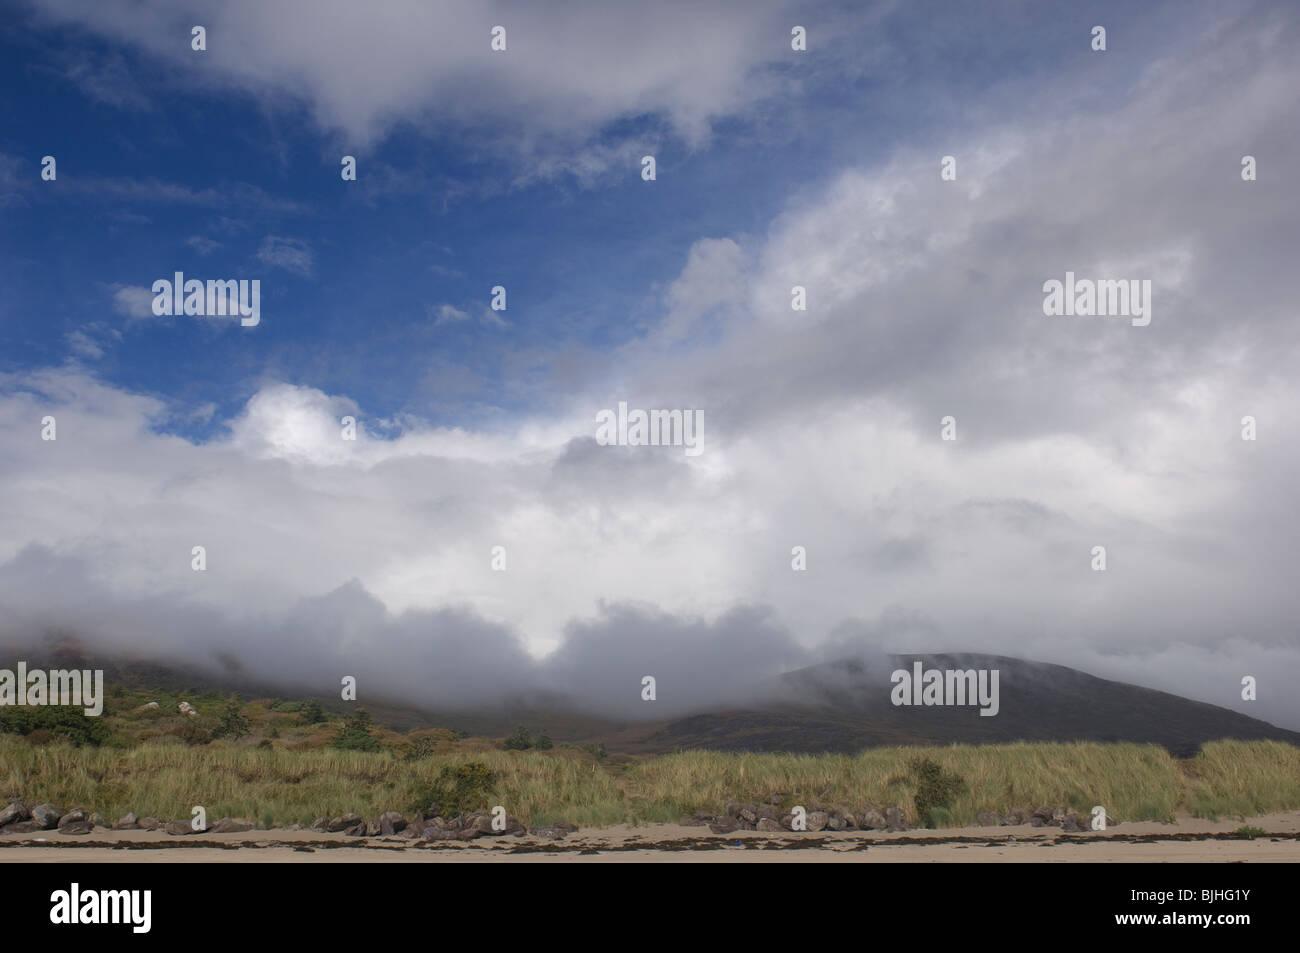 County Kerry, Ireland - John Gollop - Stock Image